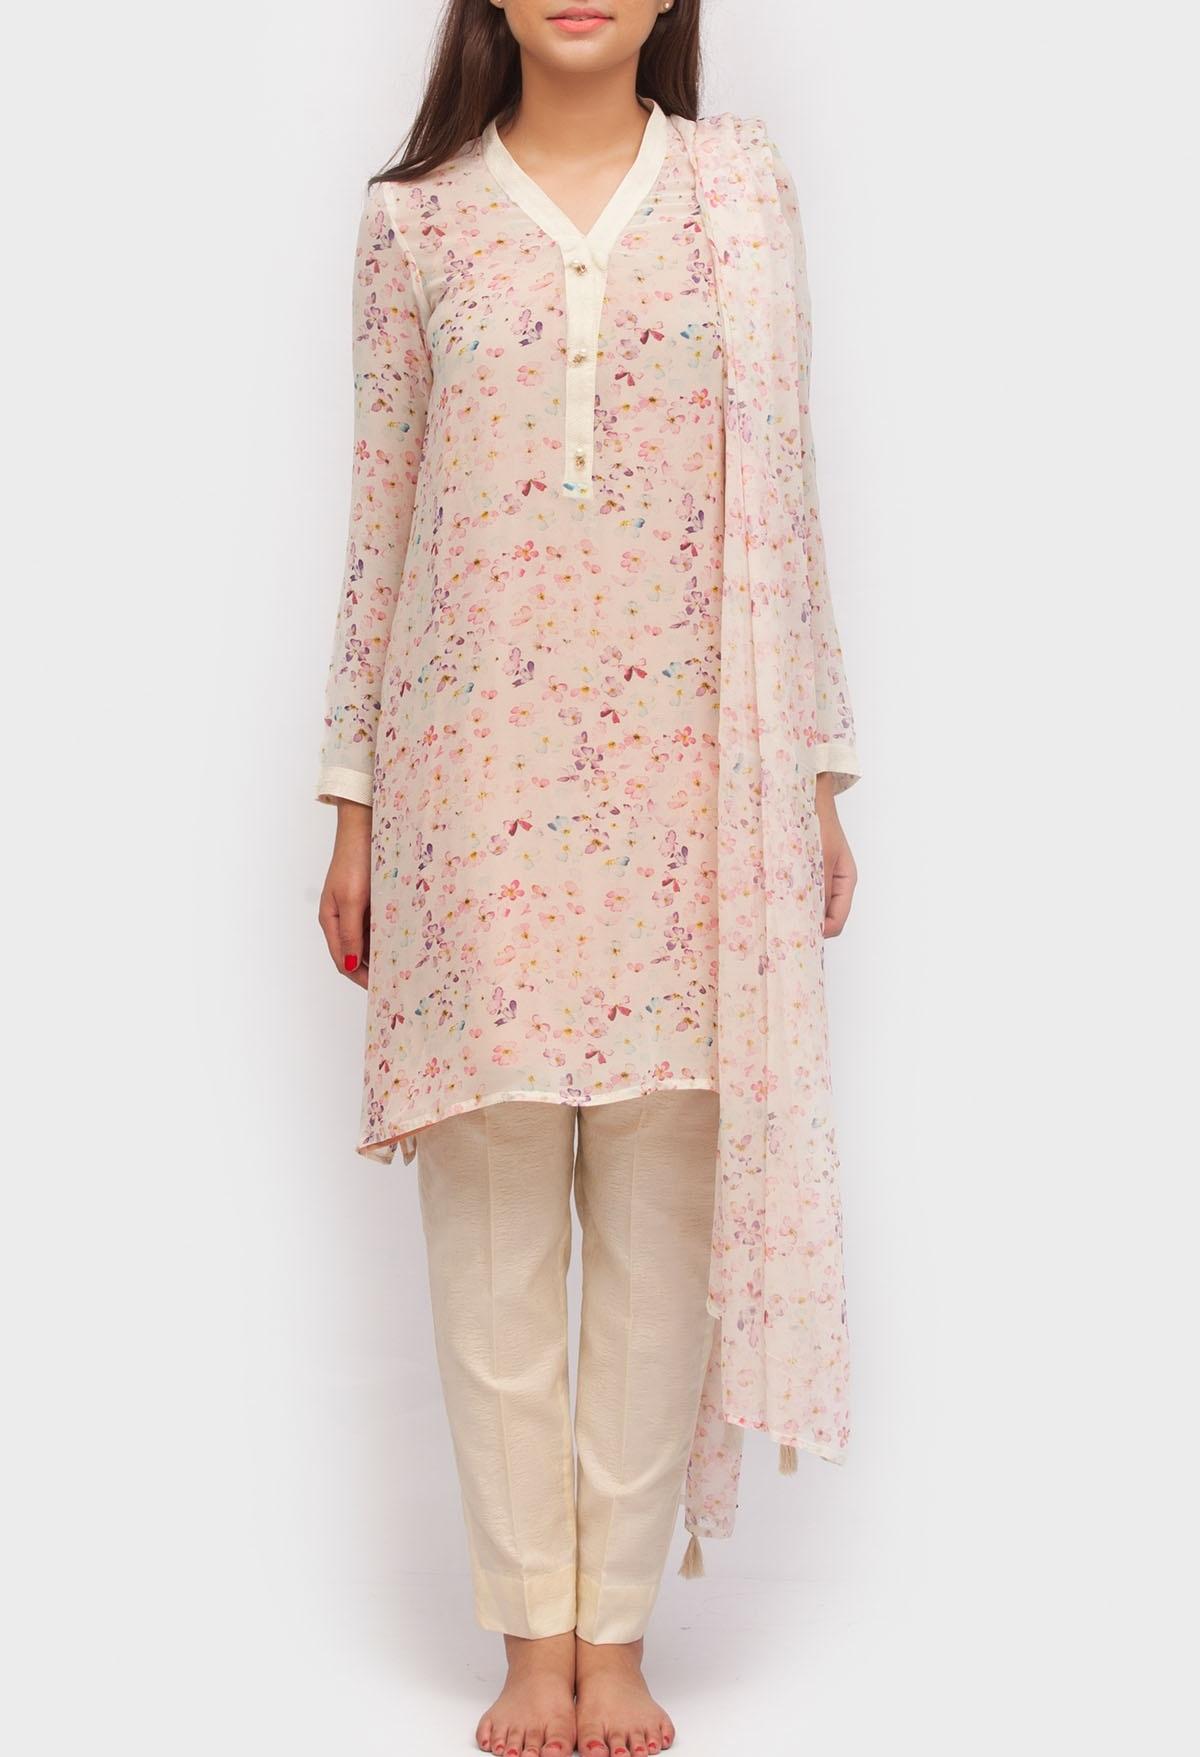 floral digital printed chiffon suit